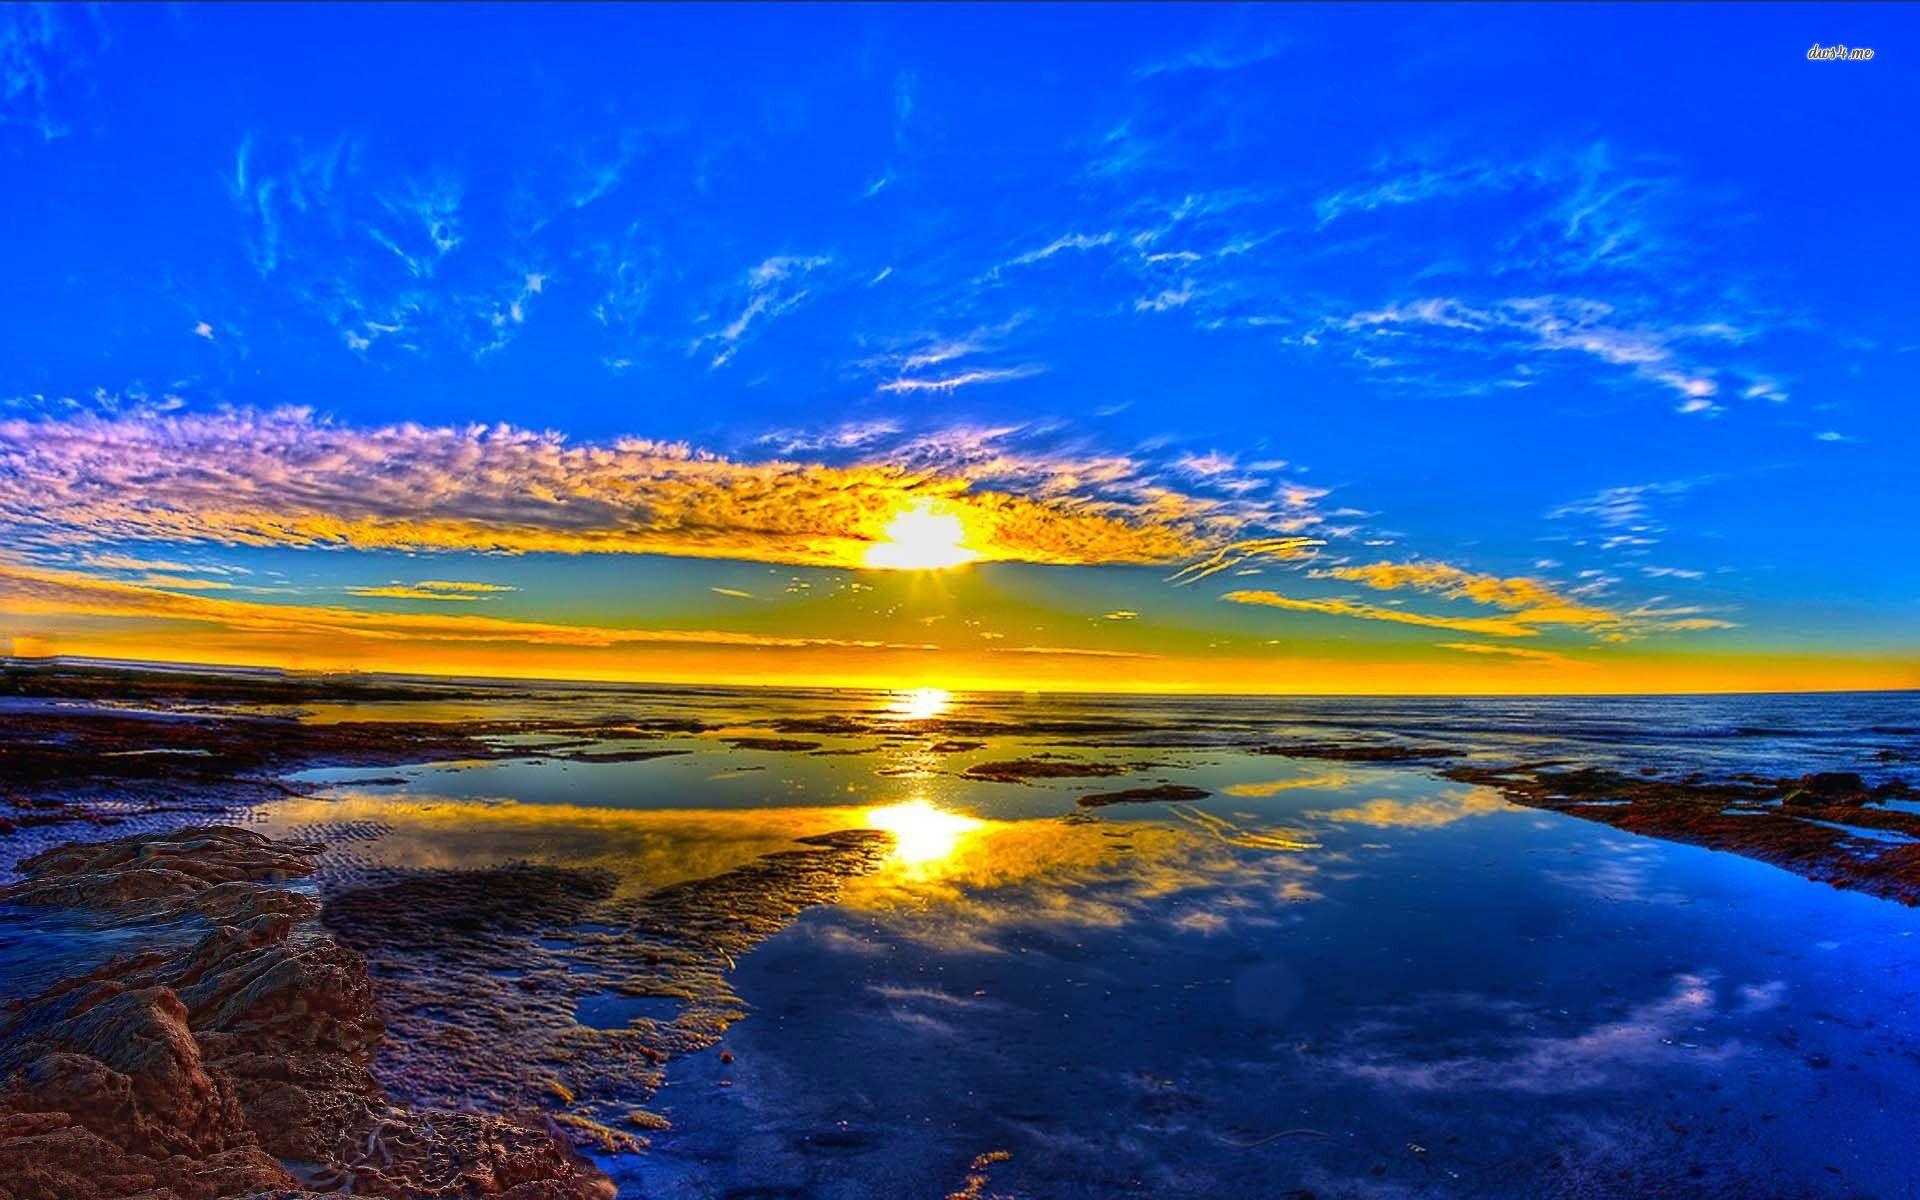 Full HD p Sunrise Wallpapers HD, Desktop Backgrounds 1600?900 ...